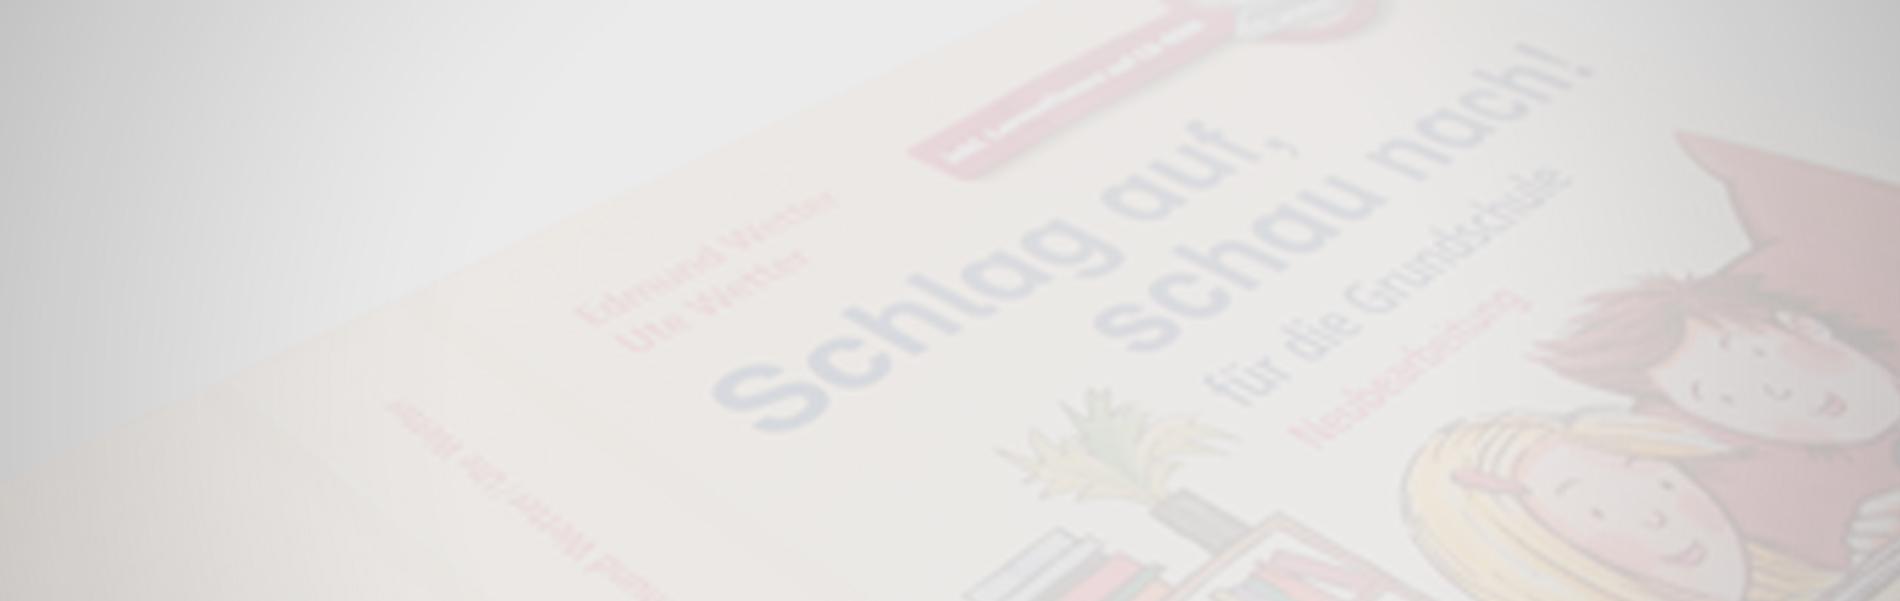 Slider_Background_11b